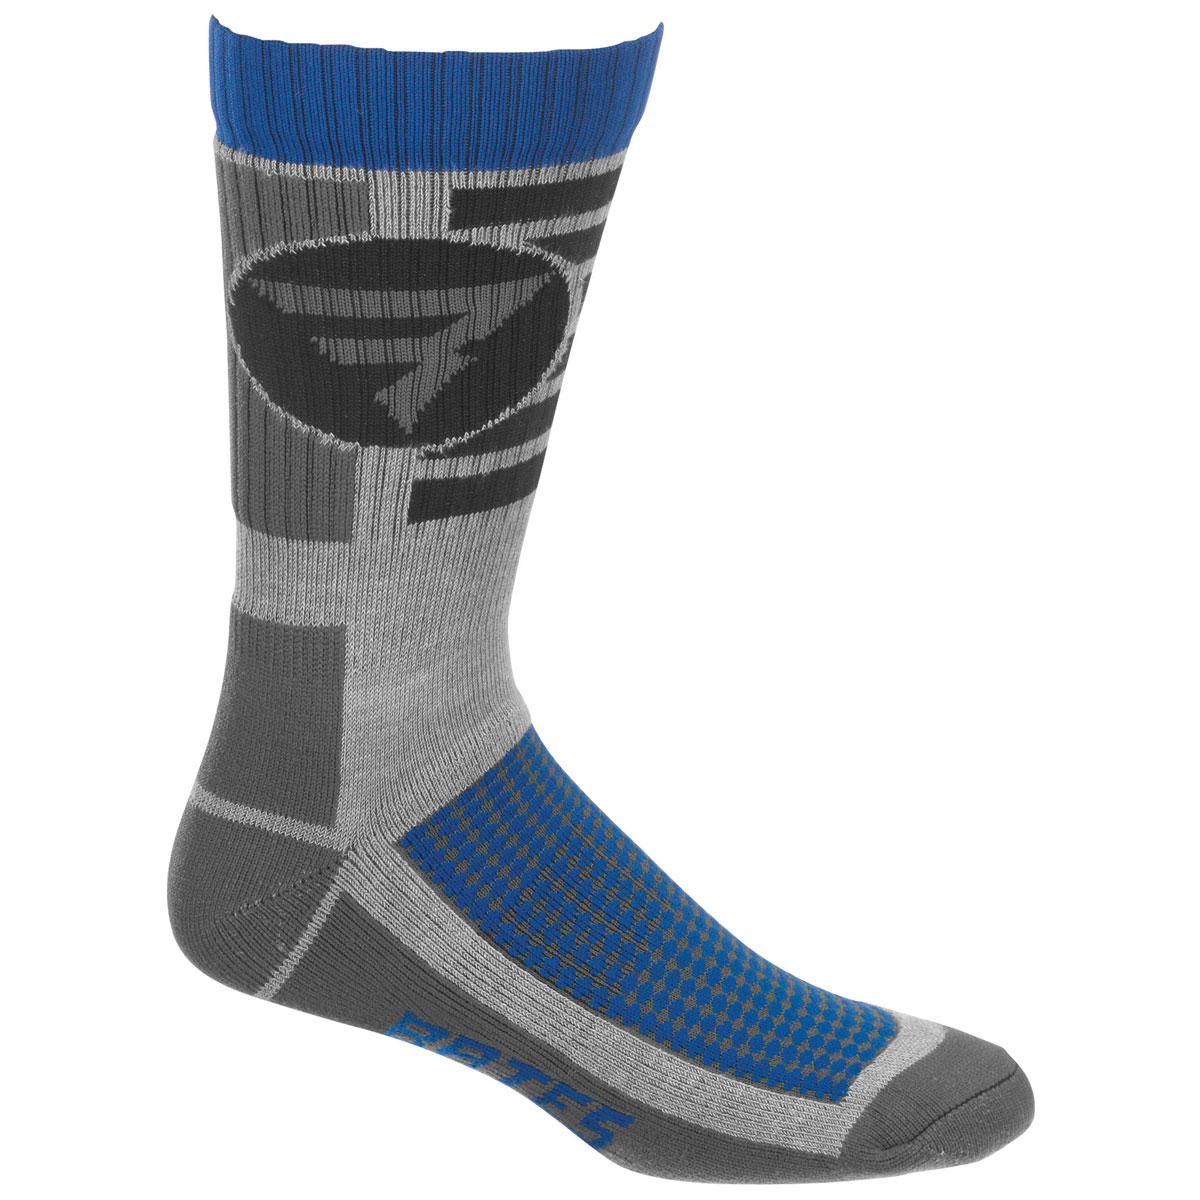 Bates Men's Performance Crew Gray Socks